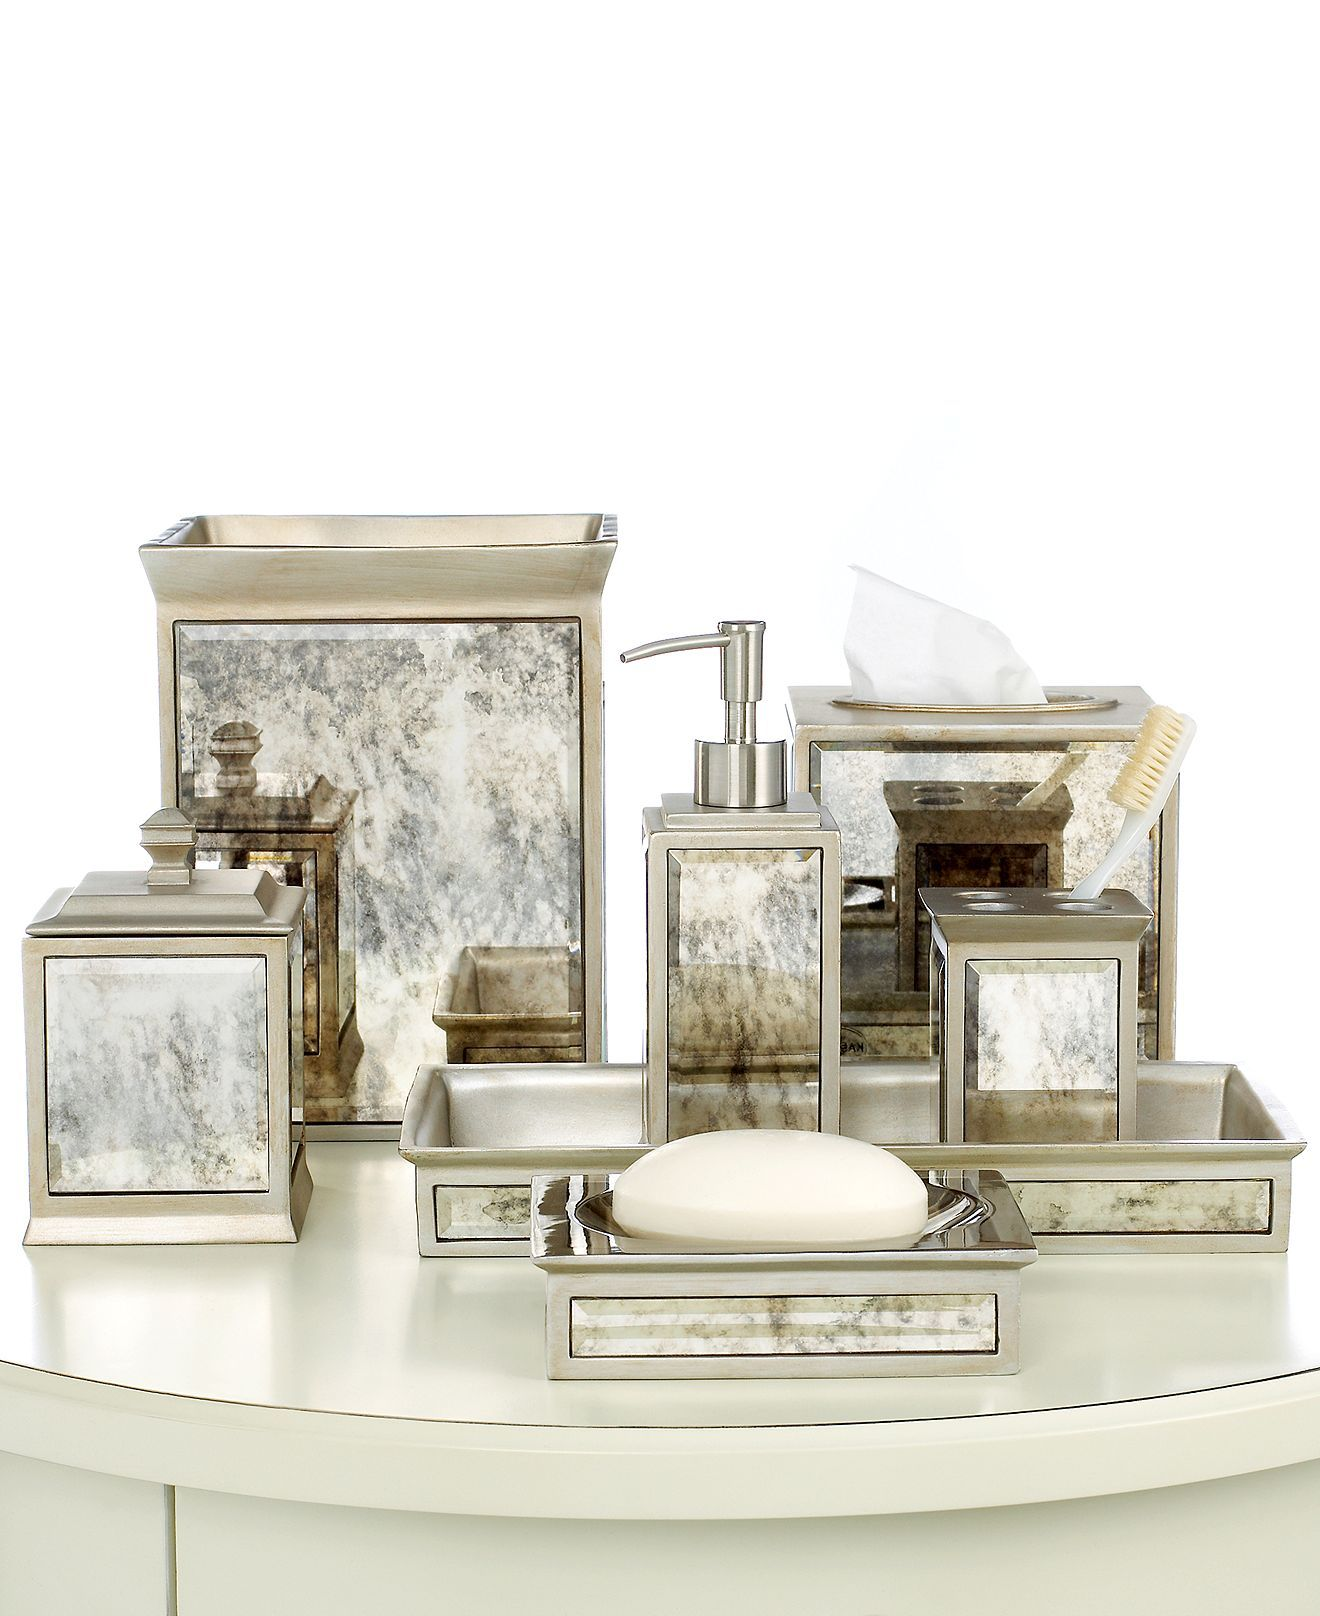 kassatex bath accessories palazzo collection  bath accessories . kassatex bath accessories palazzo collection  bathroom accessories  bed bath  macy's